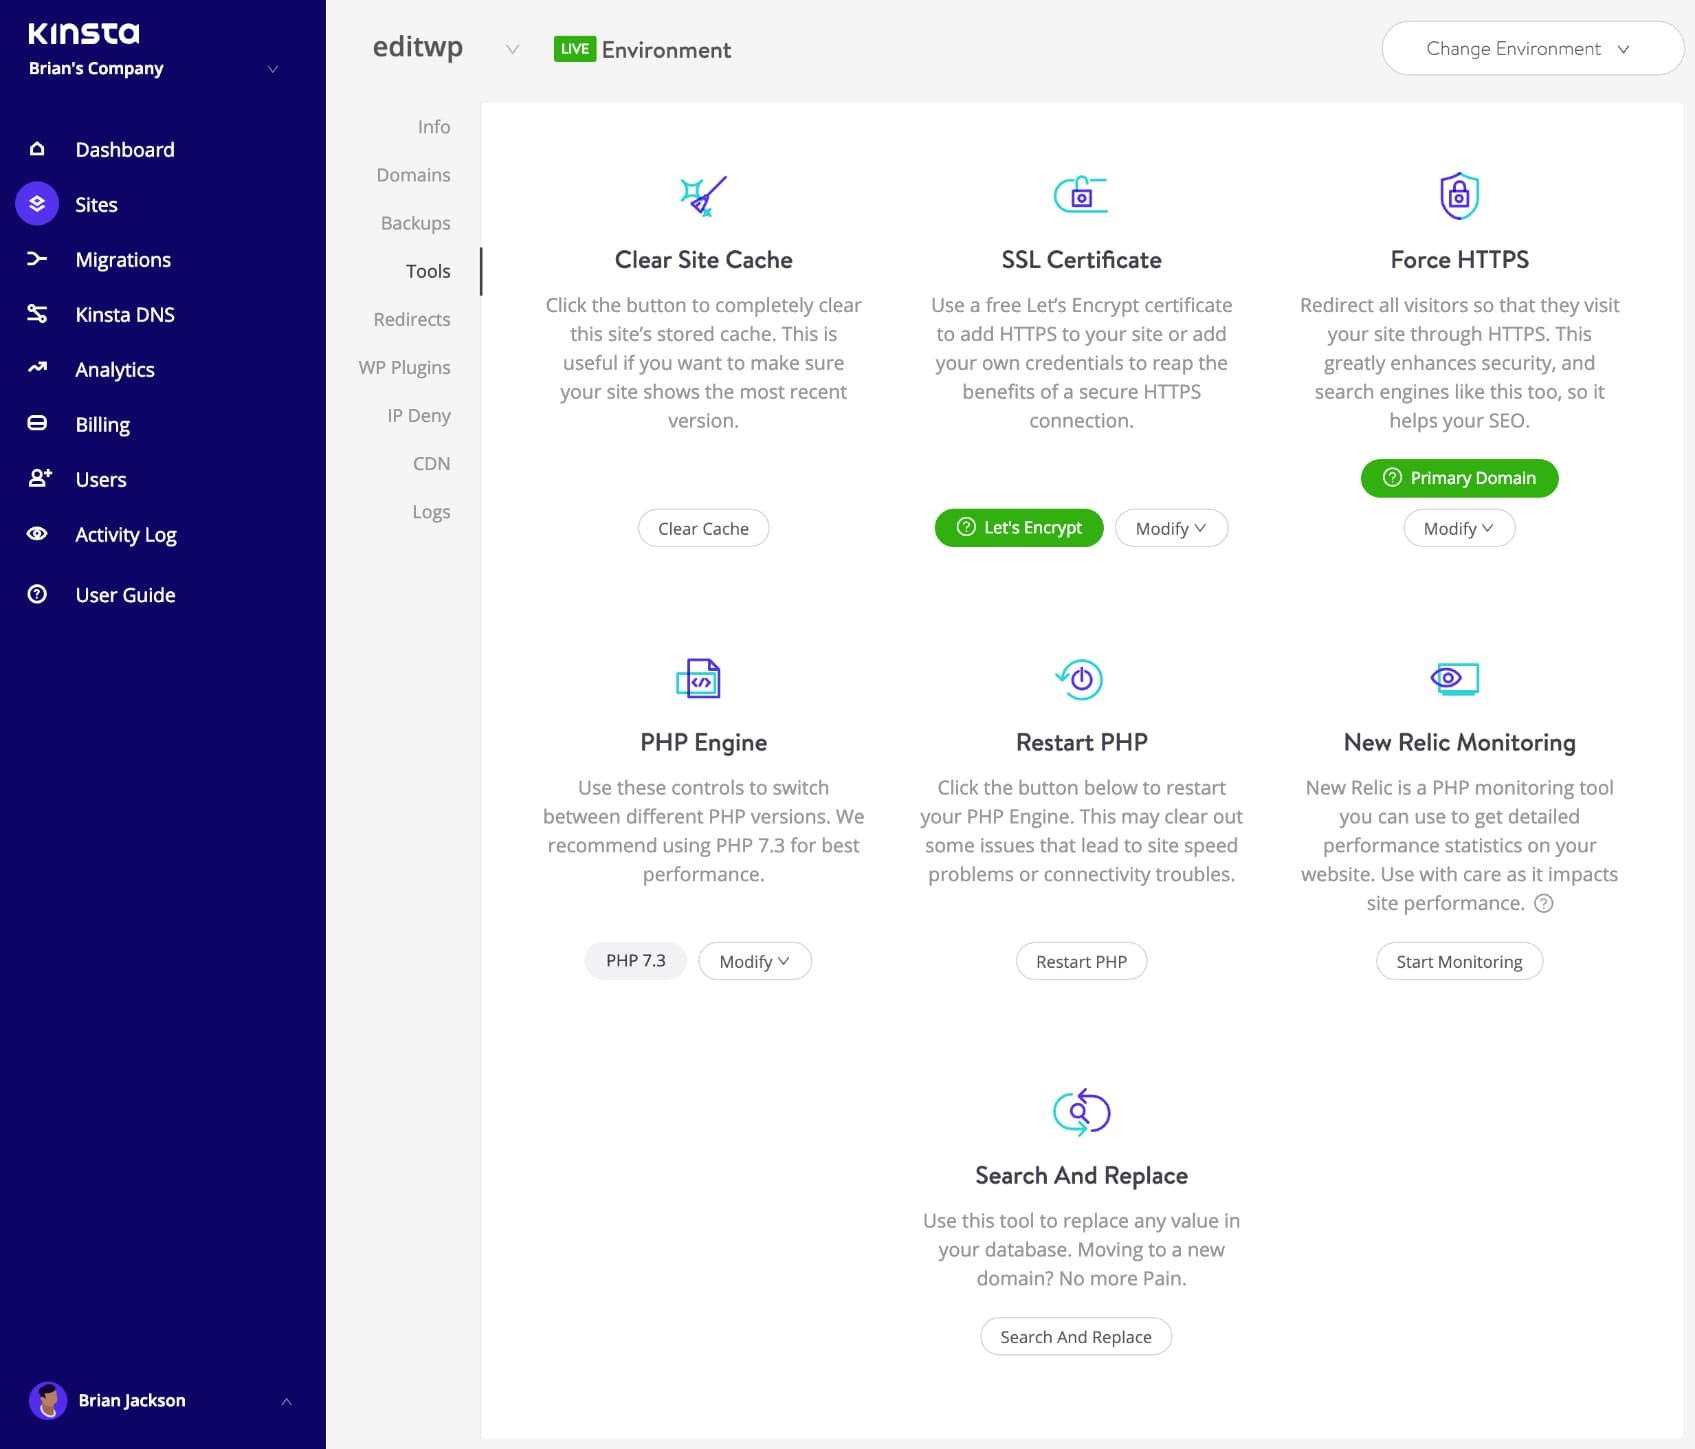 WordPress site tools